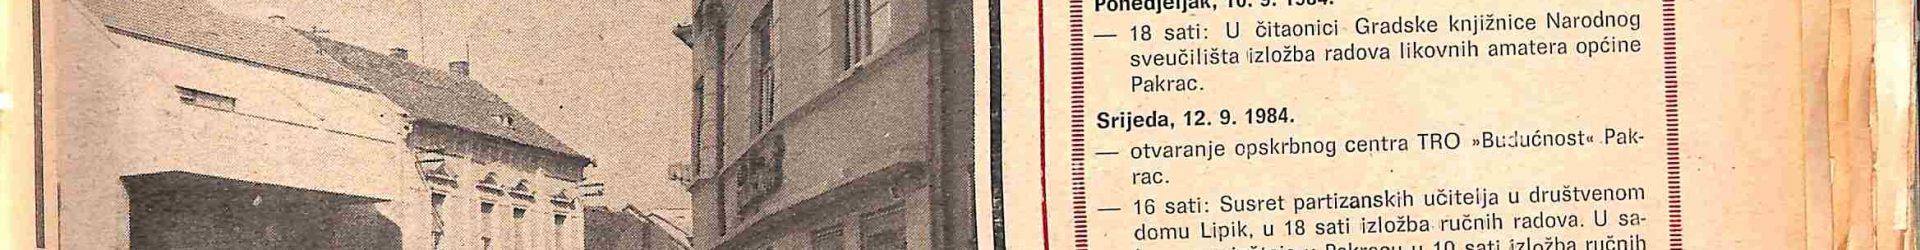 13 rujna 1984_Page_01